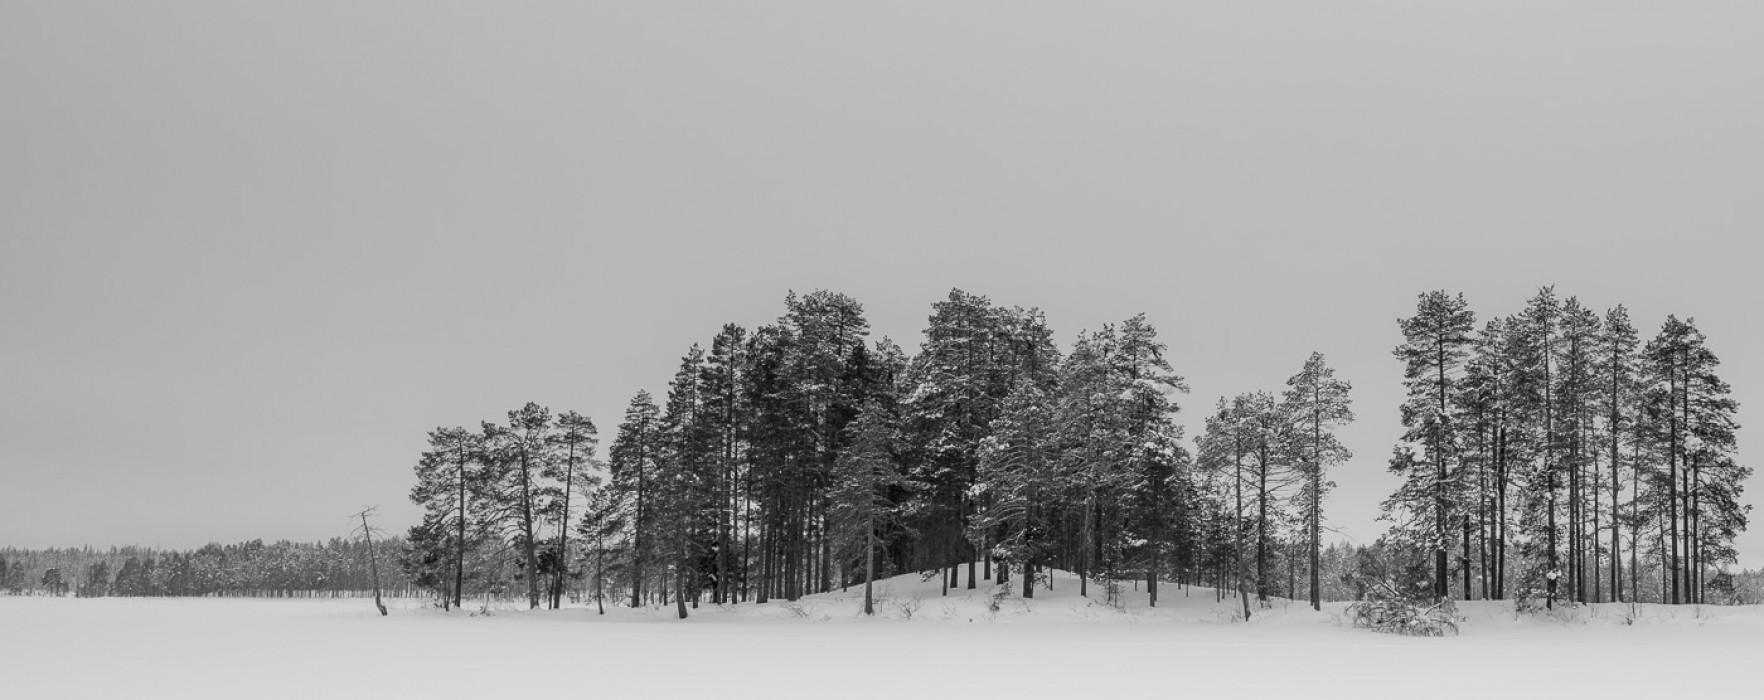 #141. Lapland in monochrome